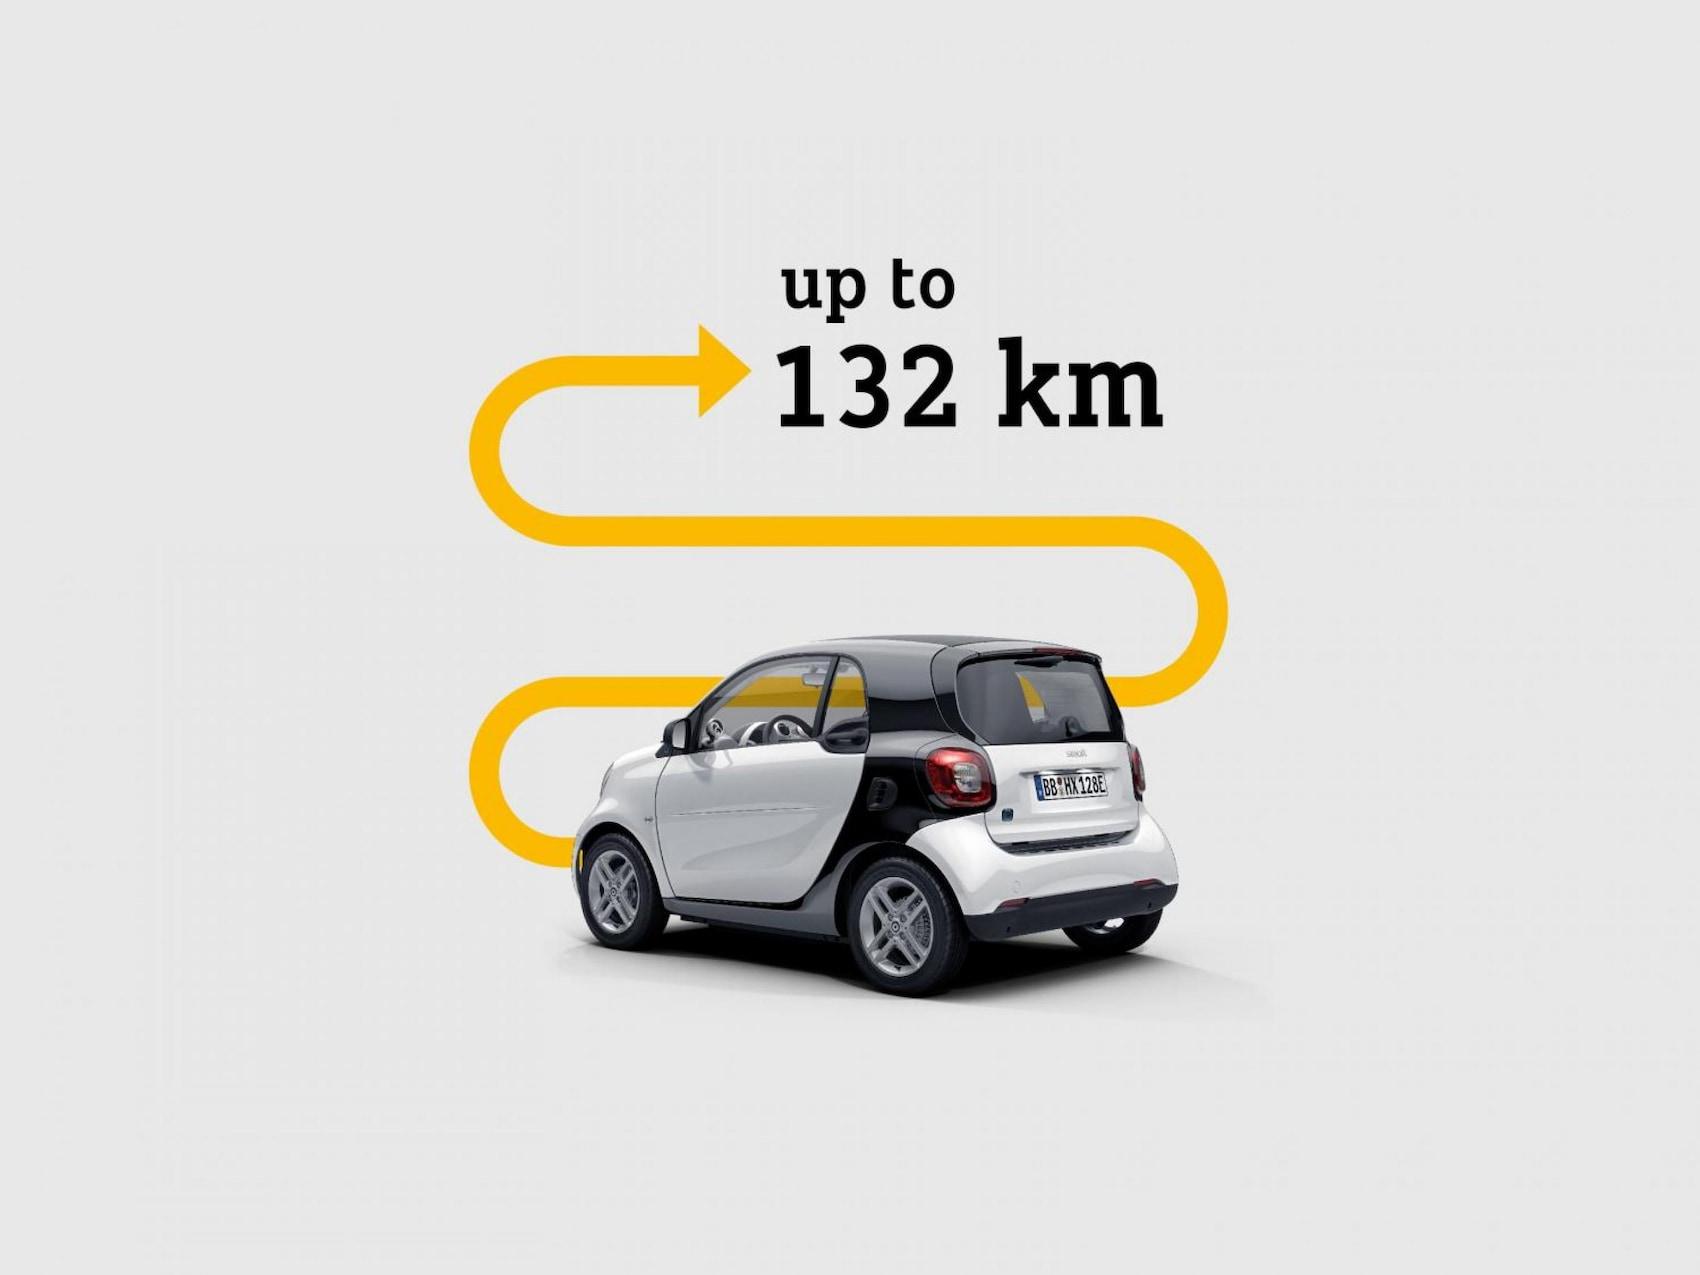 Reach 132 km